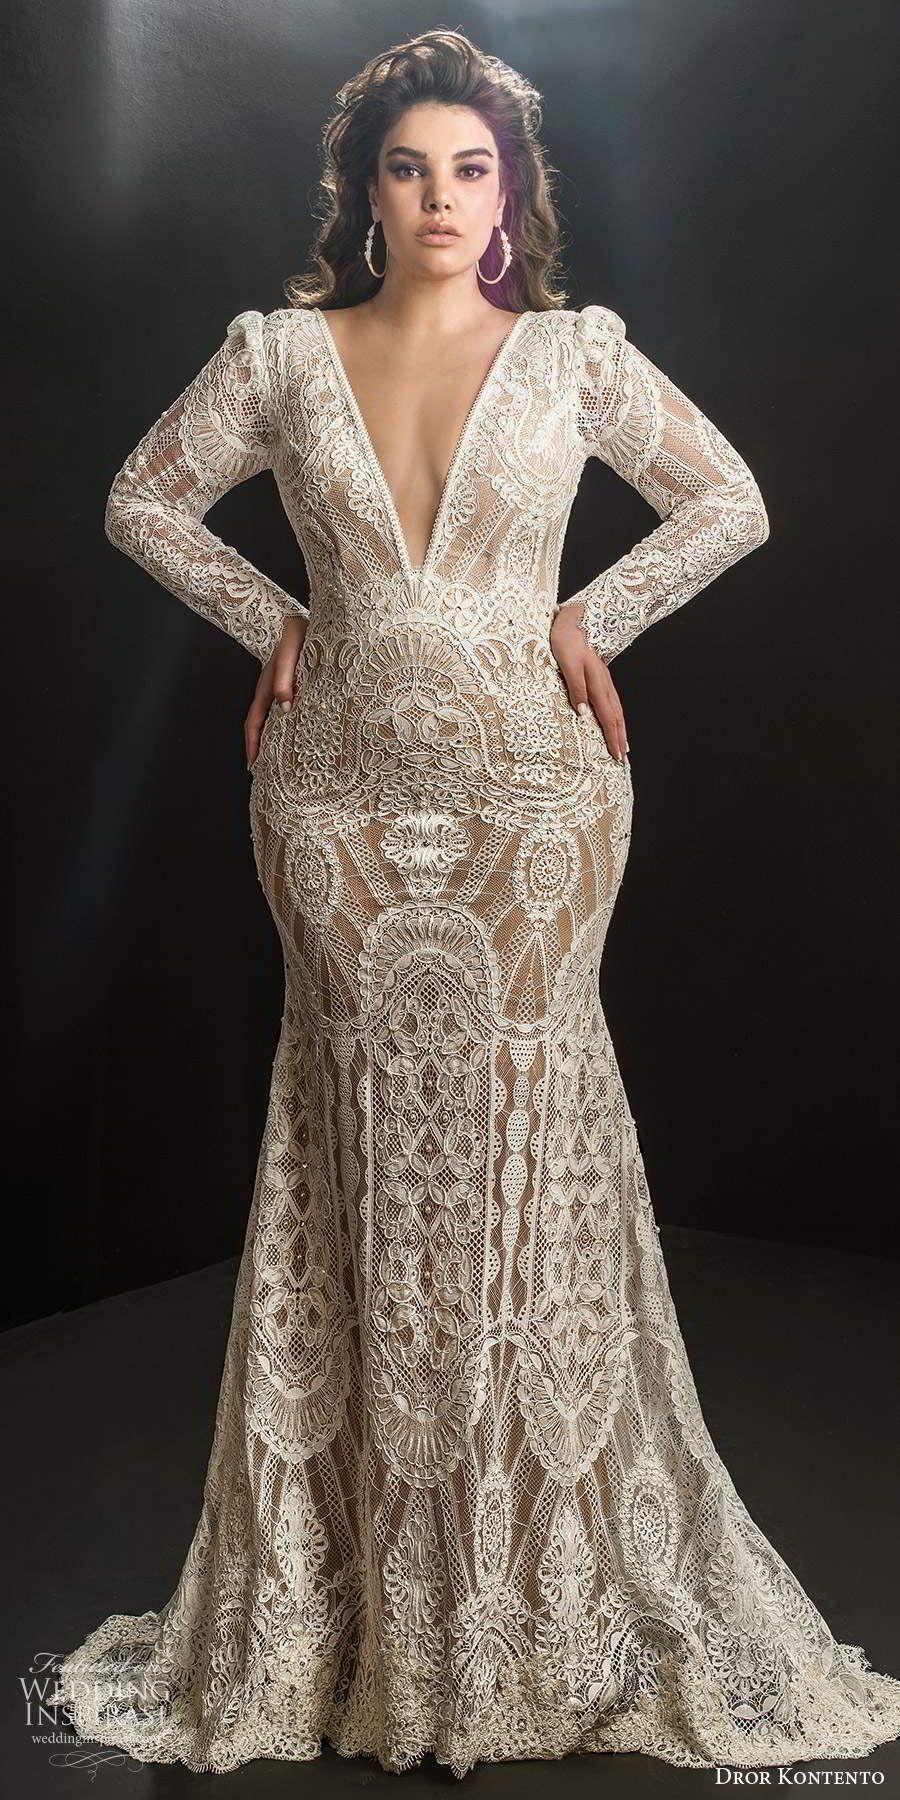 Dror Kontento 2019 Plus Size Wedding Dresses Wedding Inspirasi Plus Size Wedding Dresses With Sleeves Plus Size Wedding Gowns Plus Wedding Dresses [ 1800 x 900 Pixel ]